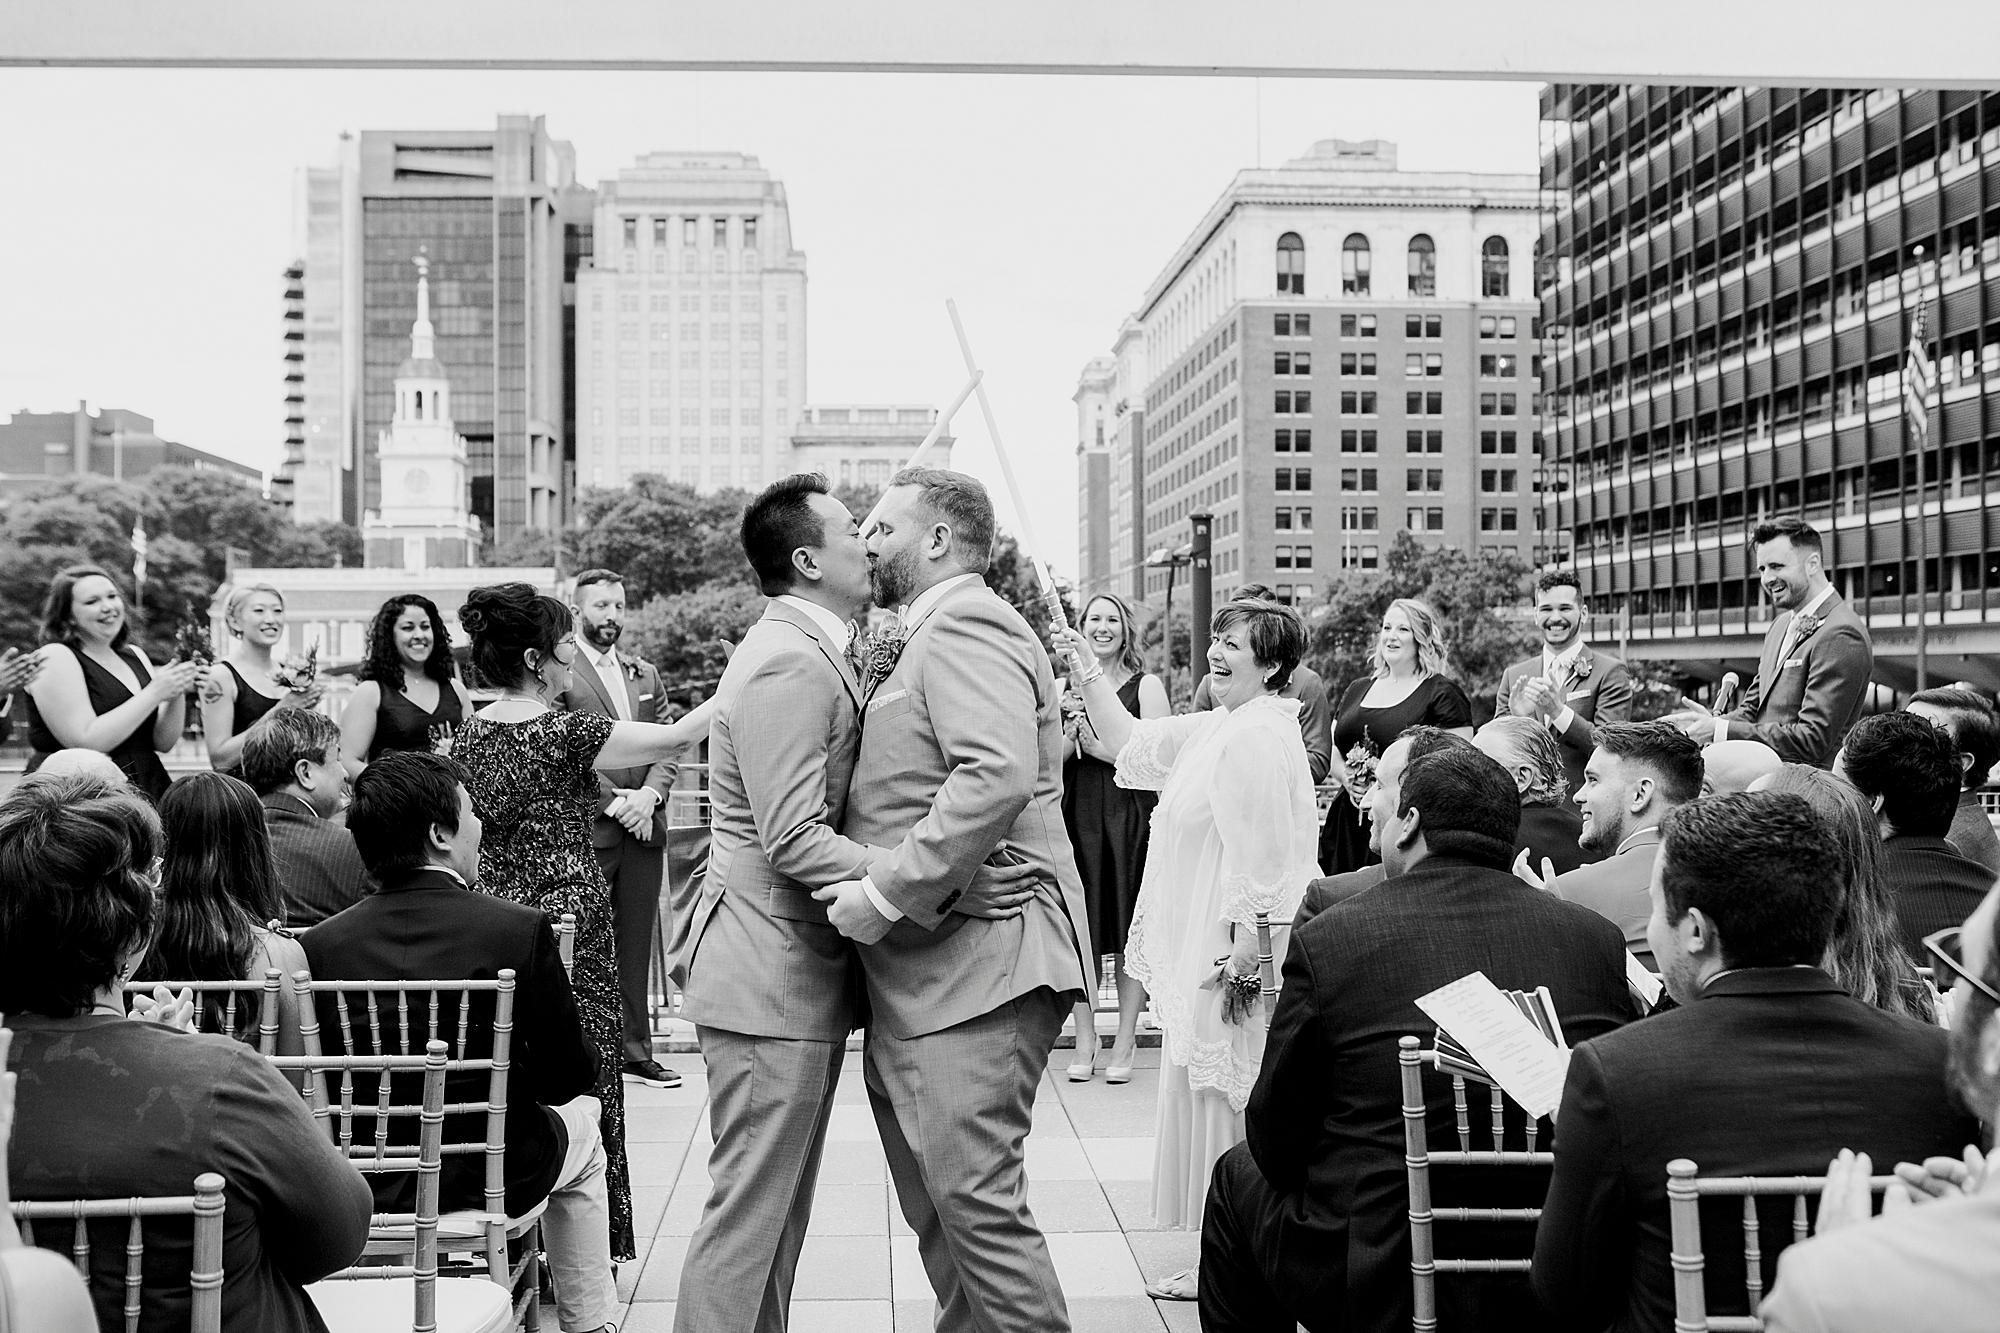 Dan_and_Byron_Love_by_Joe_Mac_Philadelphia_Wedding_LGBTQ_Photography_Gay_Independence_visitor_Center_104.JPG